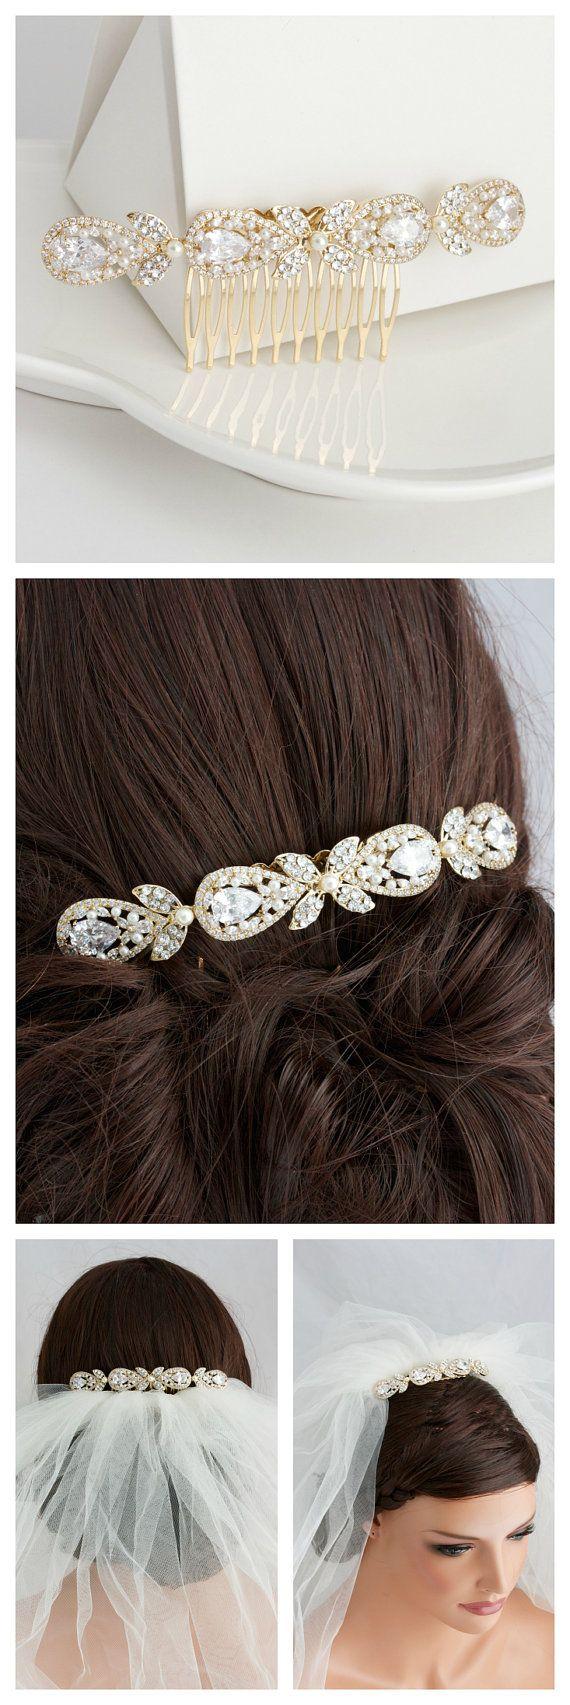 Gold Wedding Hair Accessory Bridal Hair Comb Vintage Hair Piece Crystal Veil Clip Rhinestone Gold Veil comb VIVIENNE